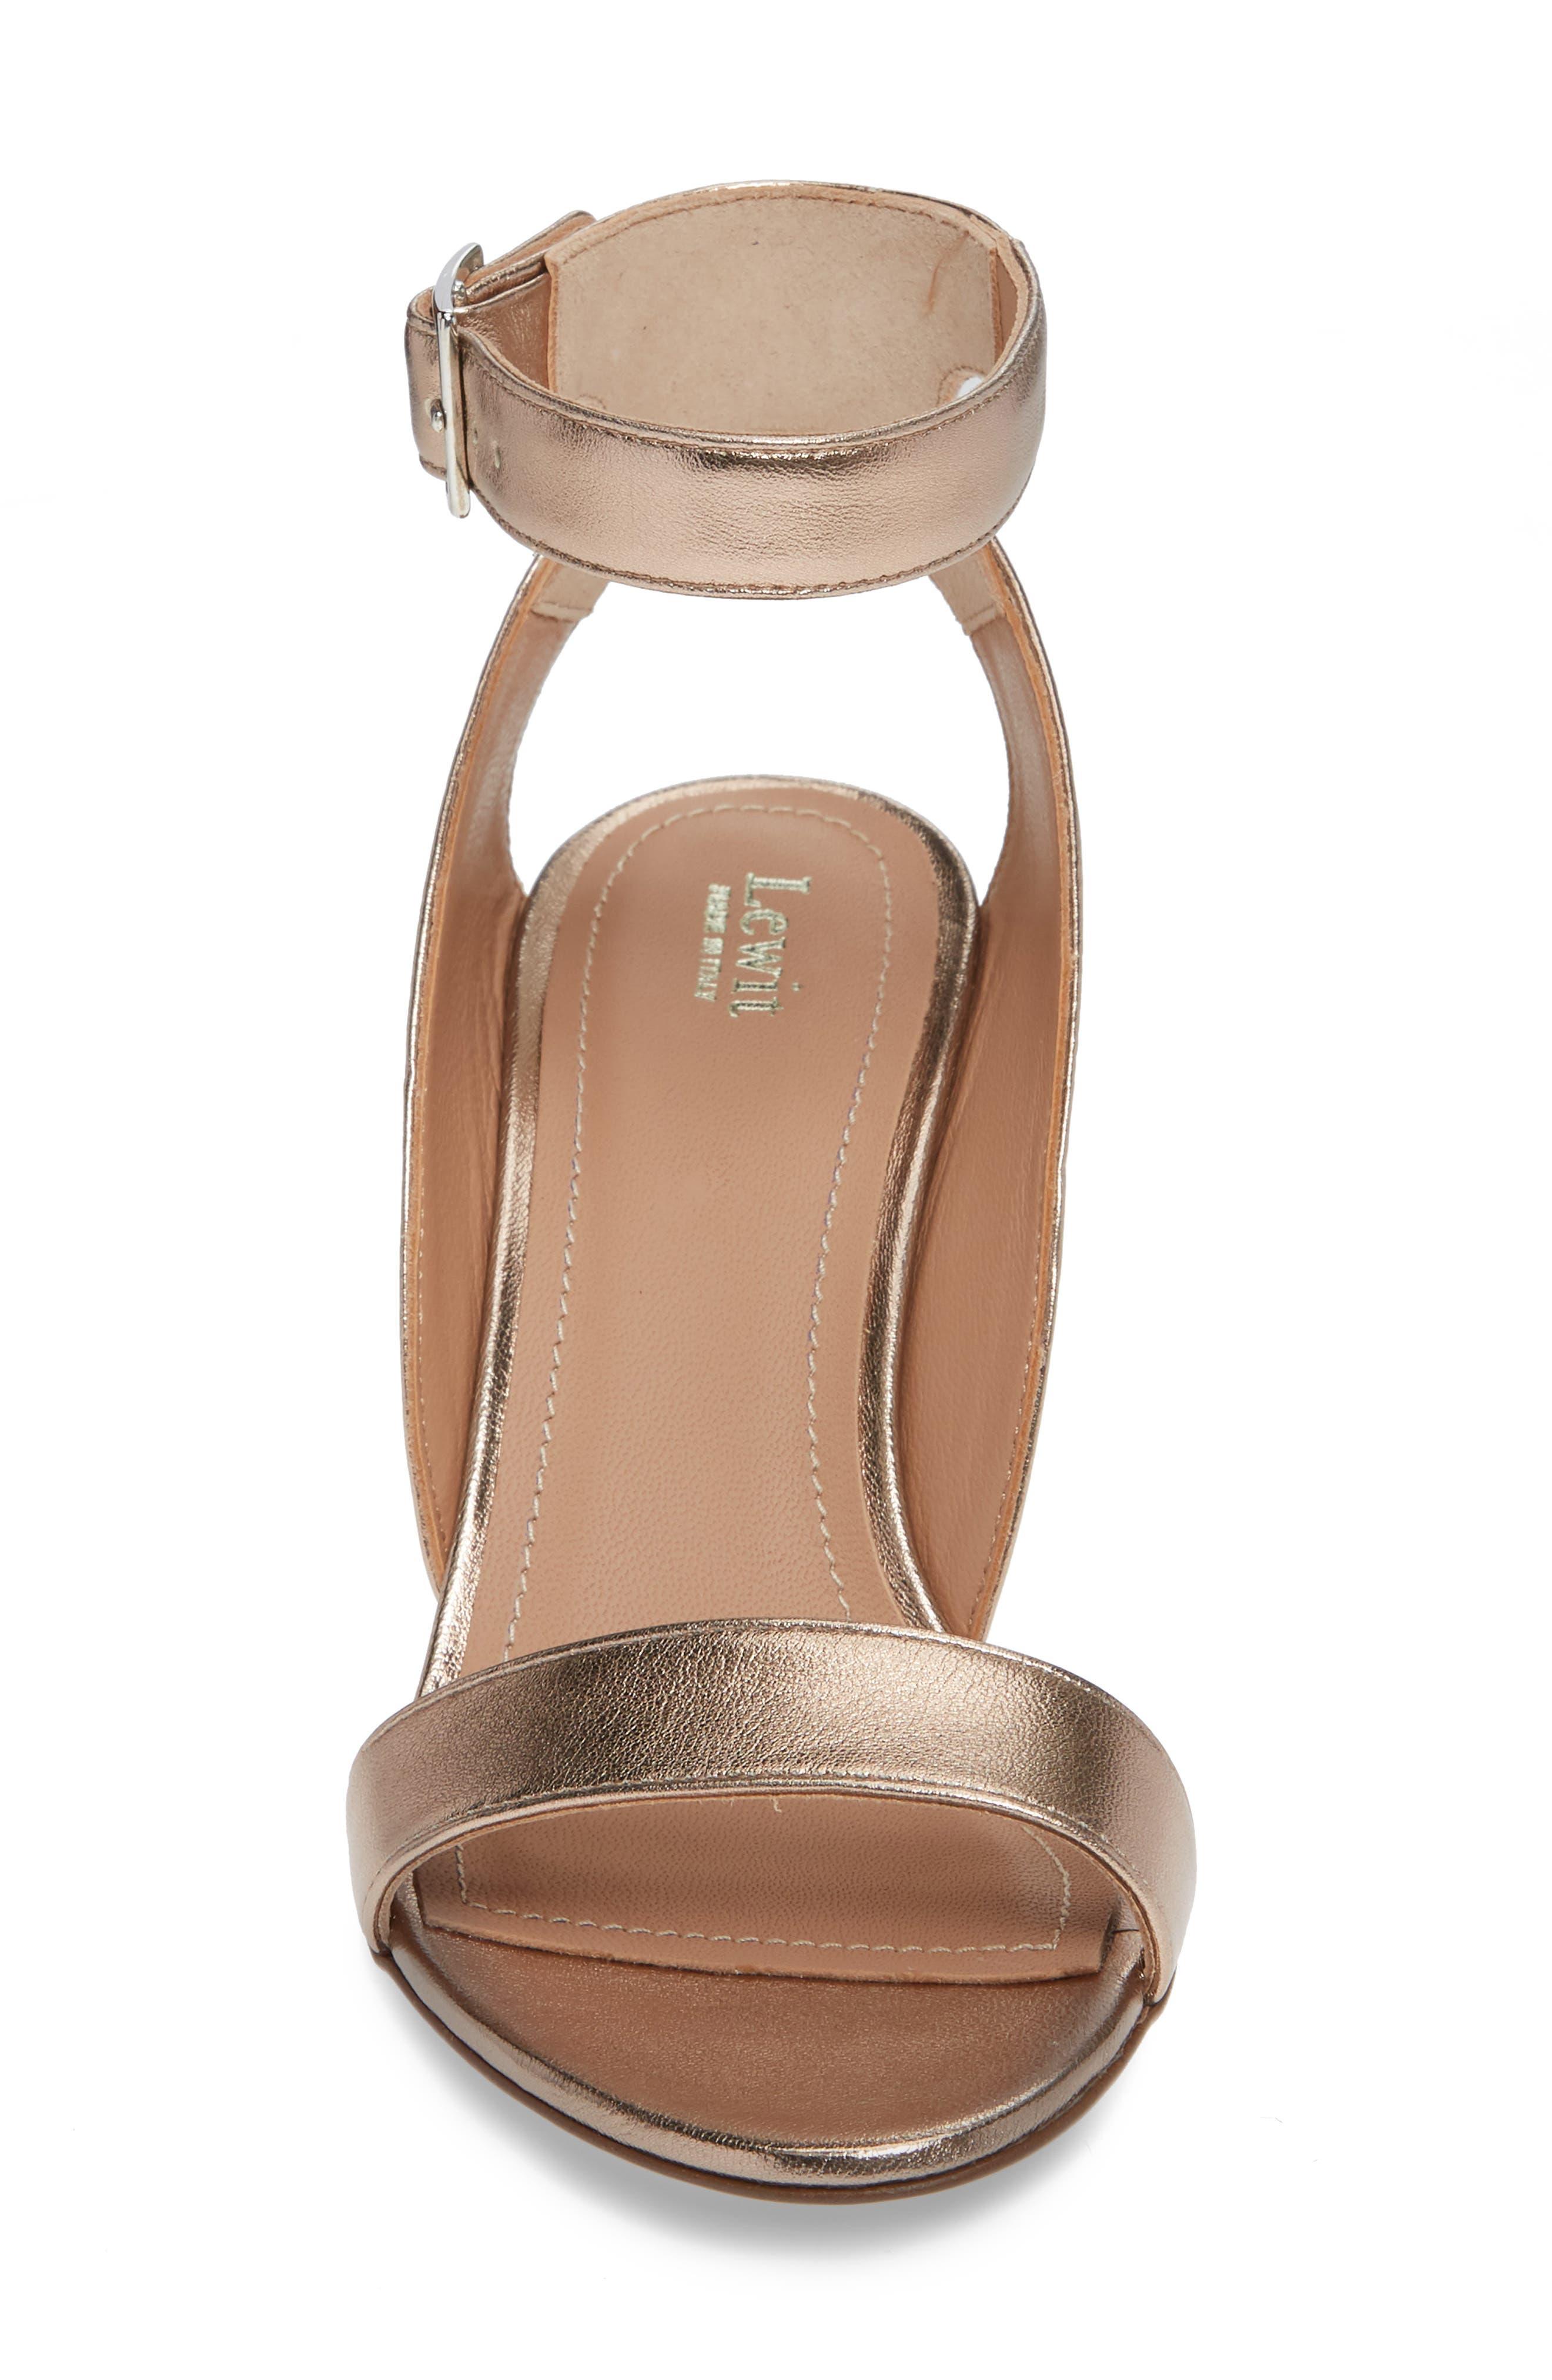 Guilia Block Heel Sandal,                             Alternate thumbnail 4, color,                             BRONZE LEATHER